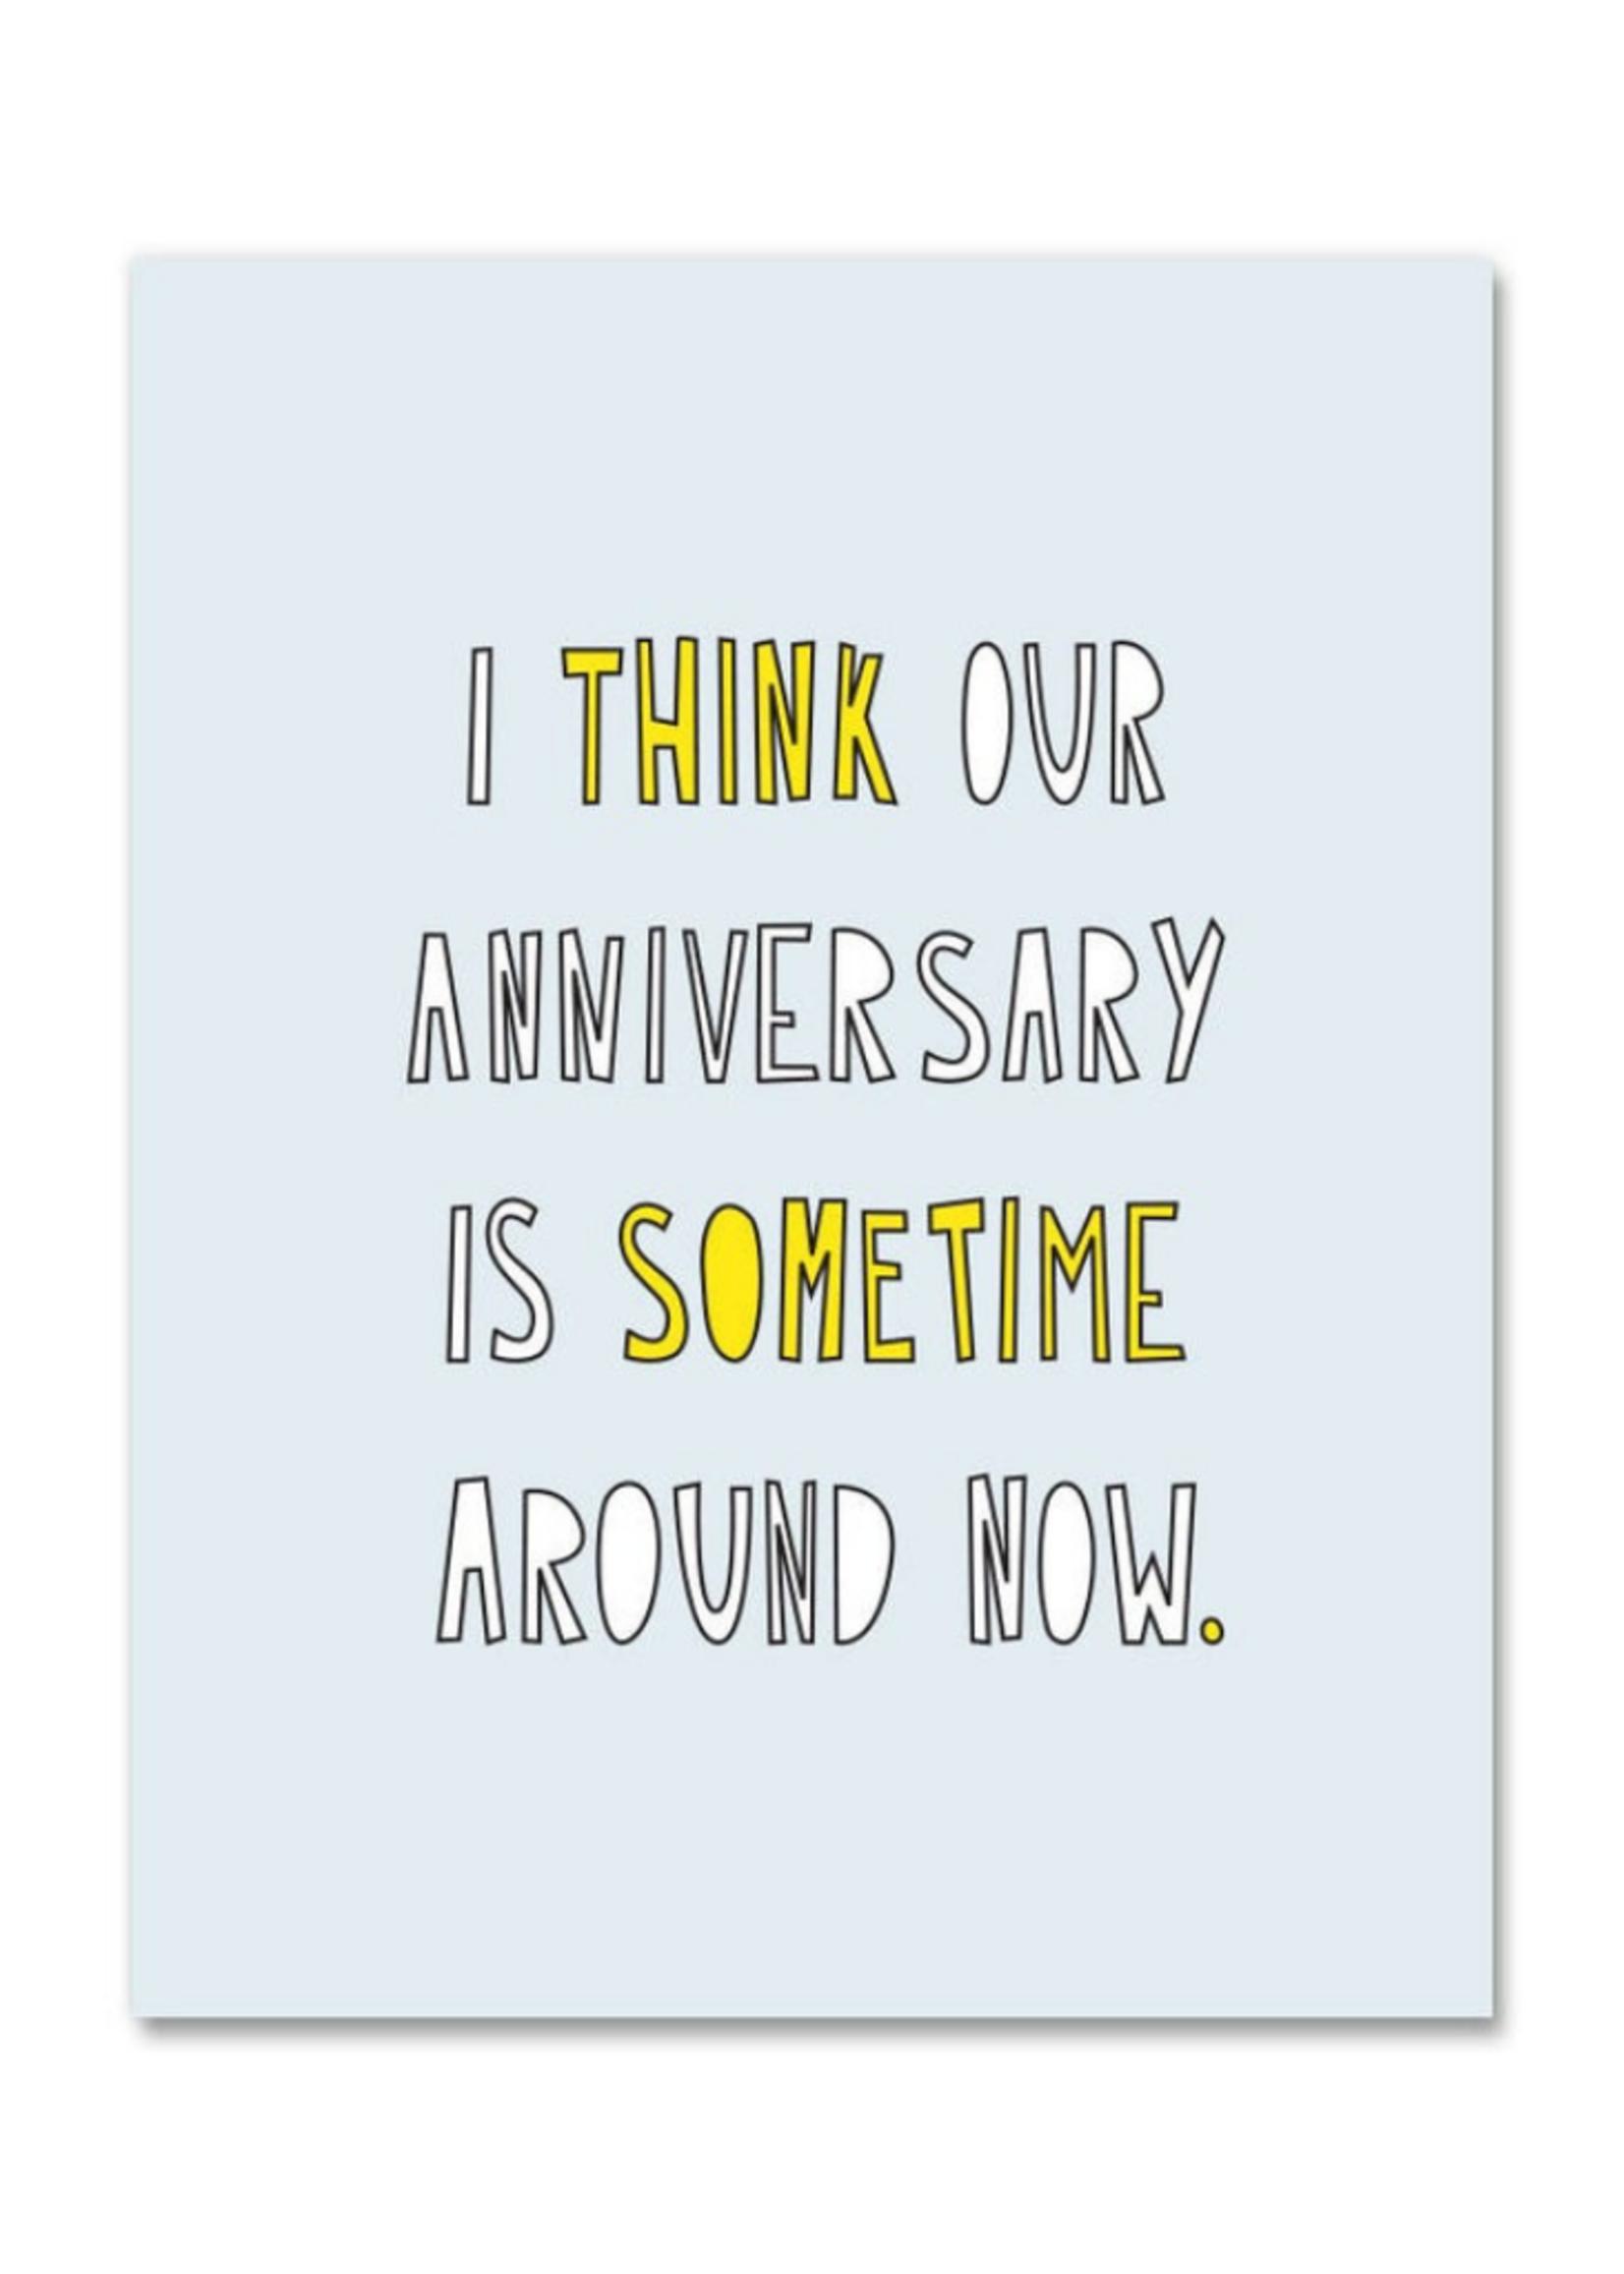 Near Modern Disaster Sometime Around Now Anniversary Card